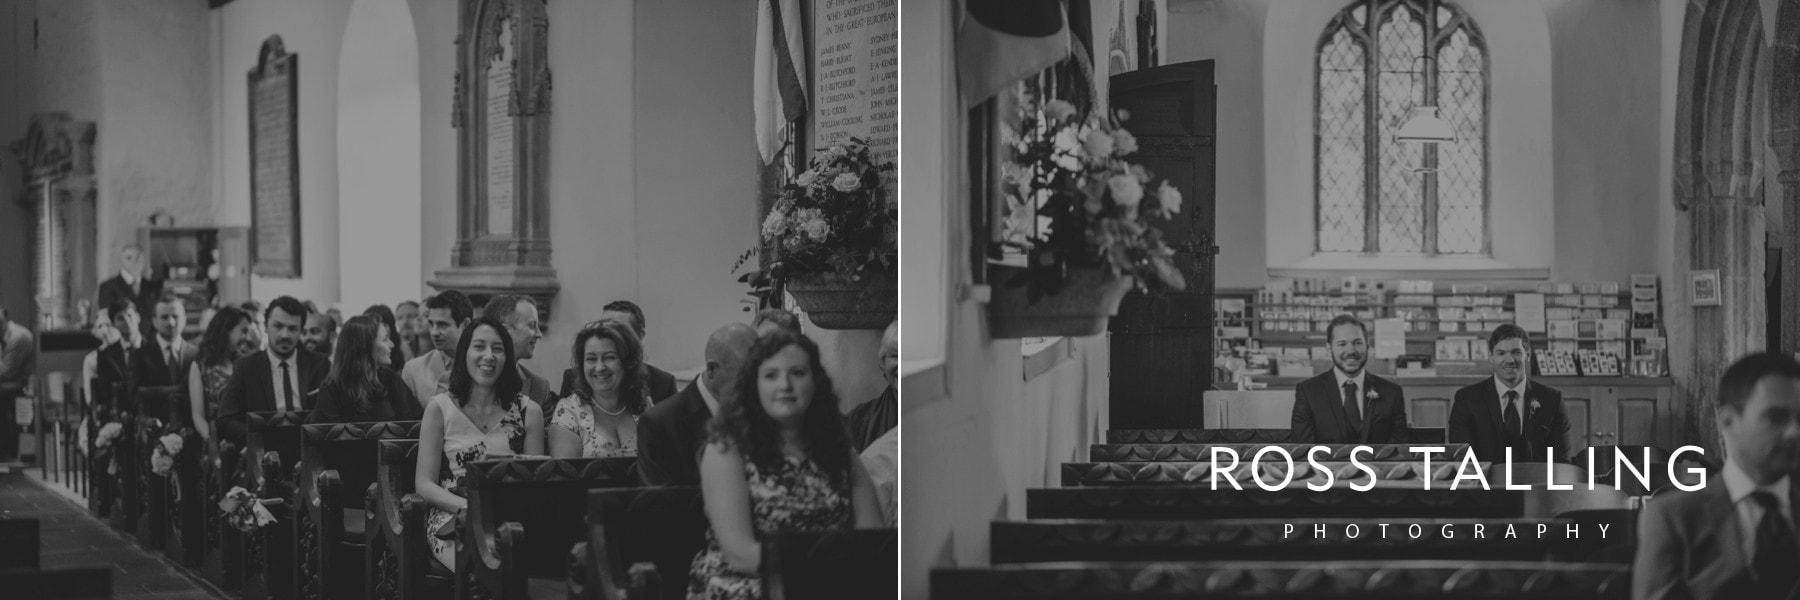 laura-matts-rosevine-hotel-wedding-photography-cornwall_0082